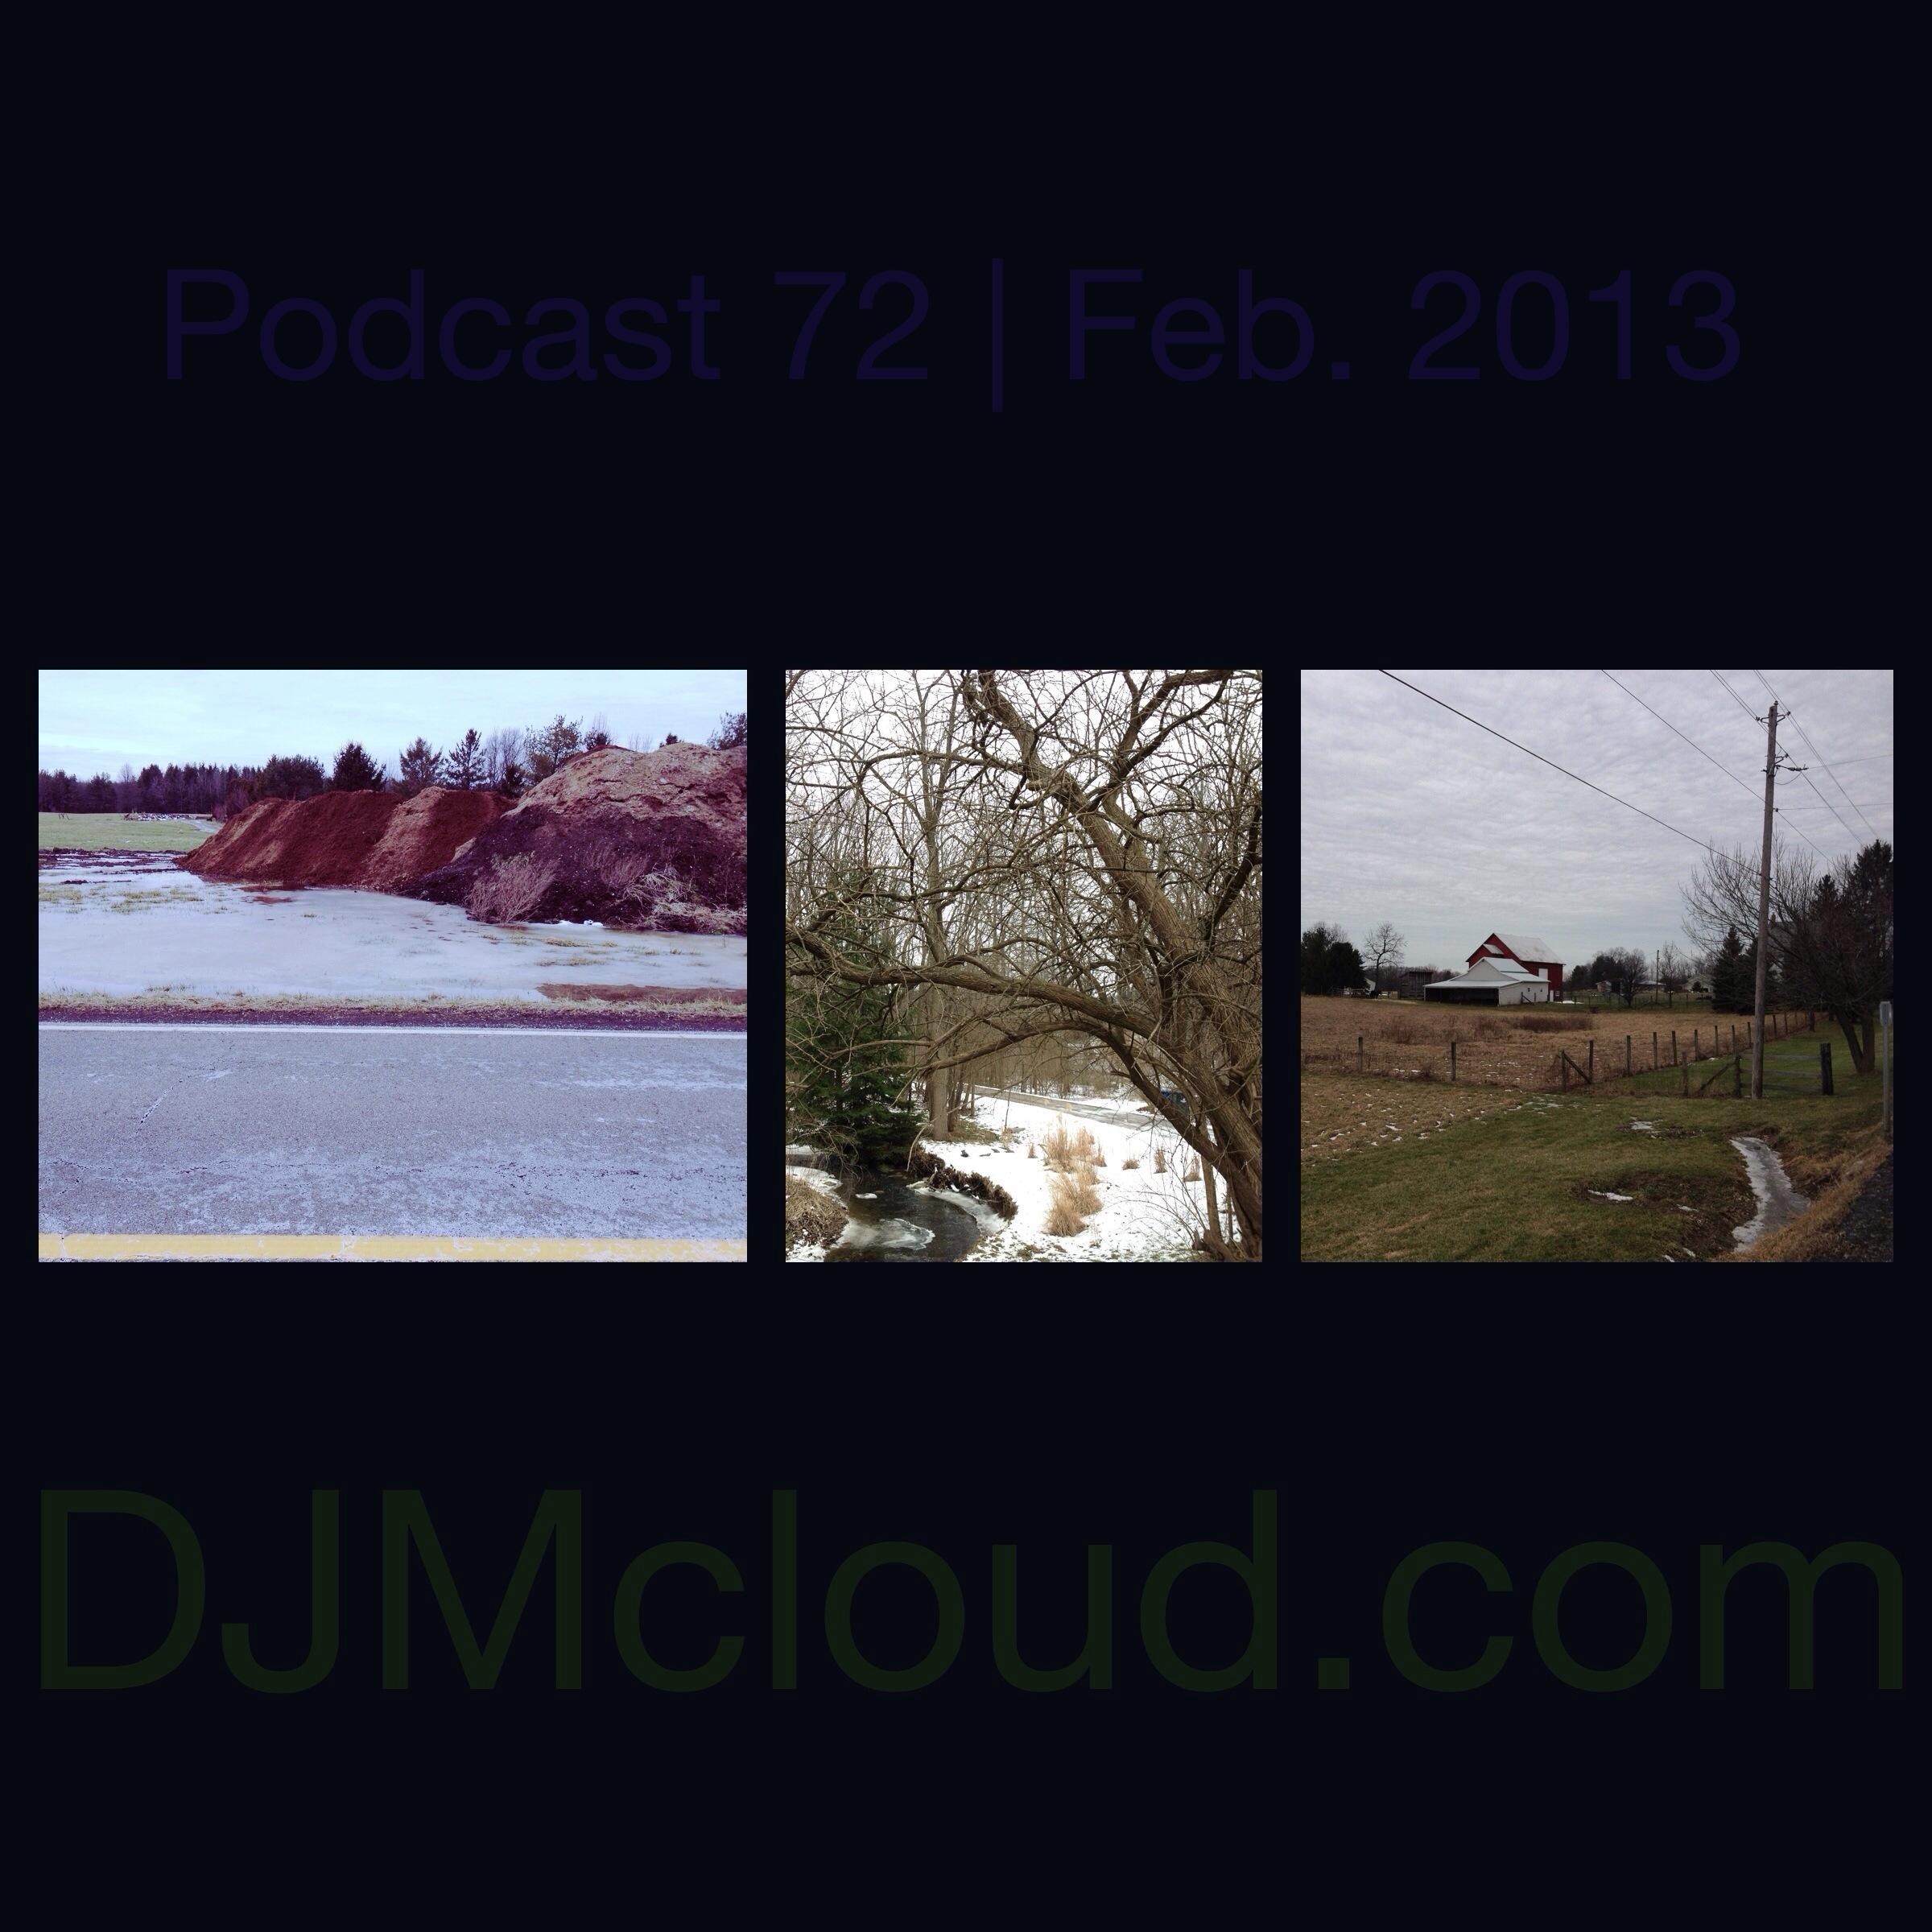 djmcloudpodcast72artworkFeb2013ByDanMcKeown